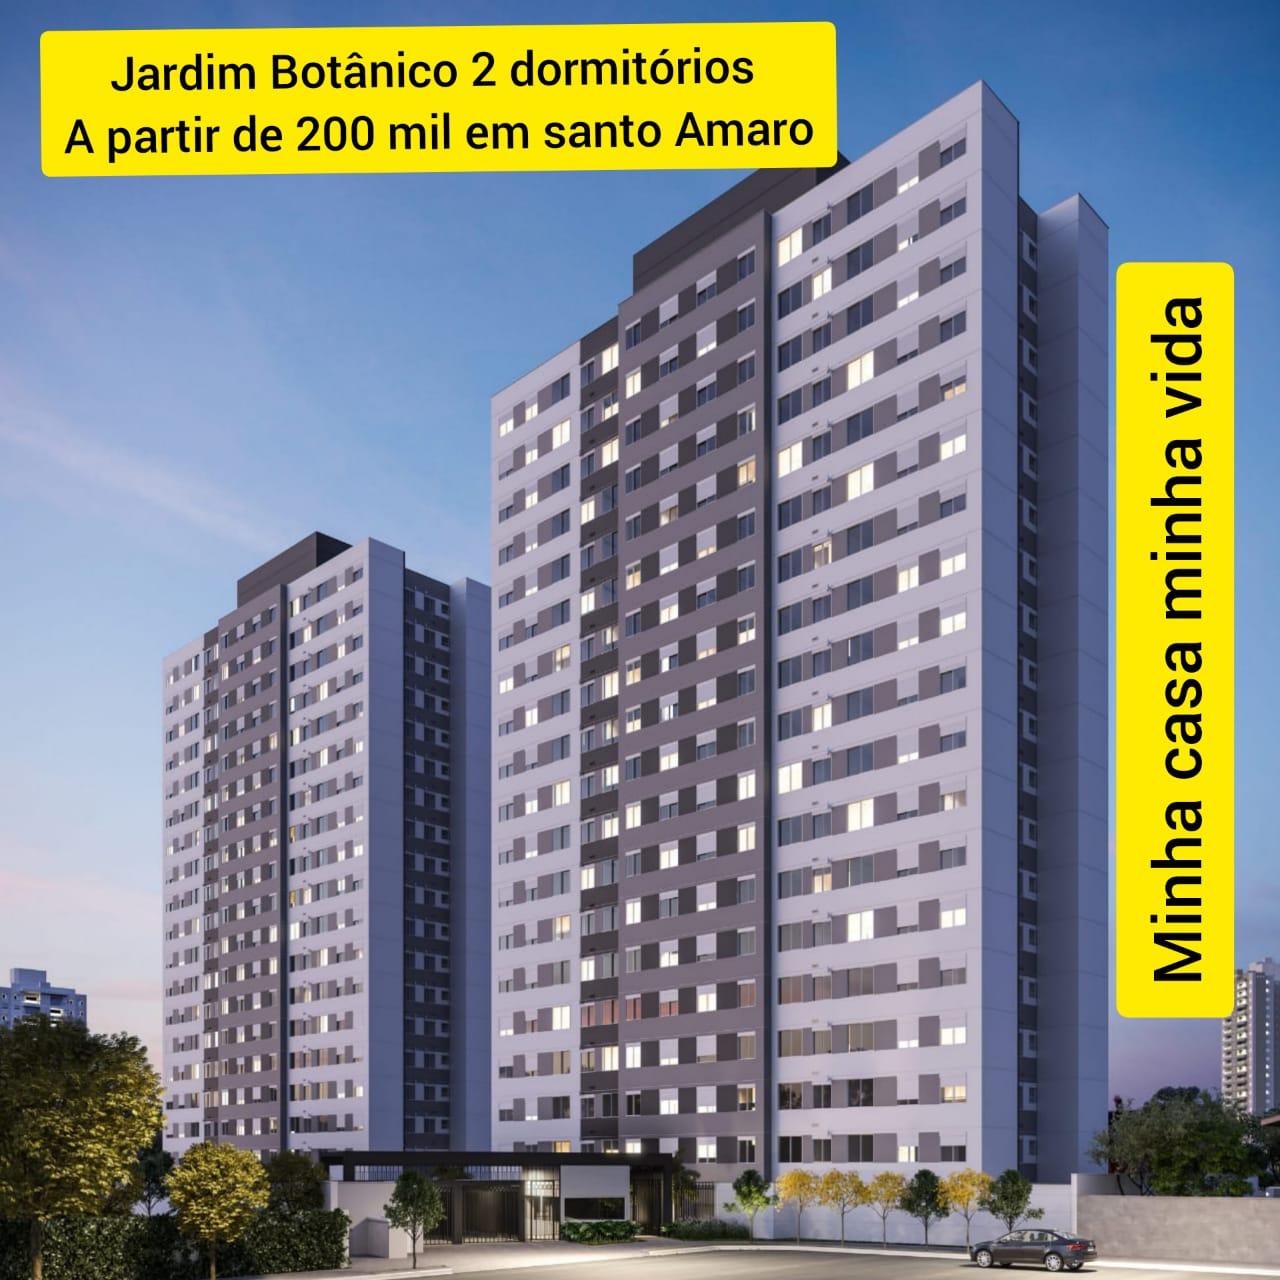 JARDIM BOTÂNICO/ TECNISA SANTO AMARO